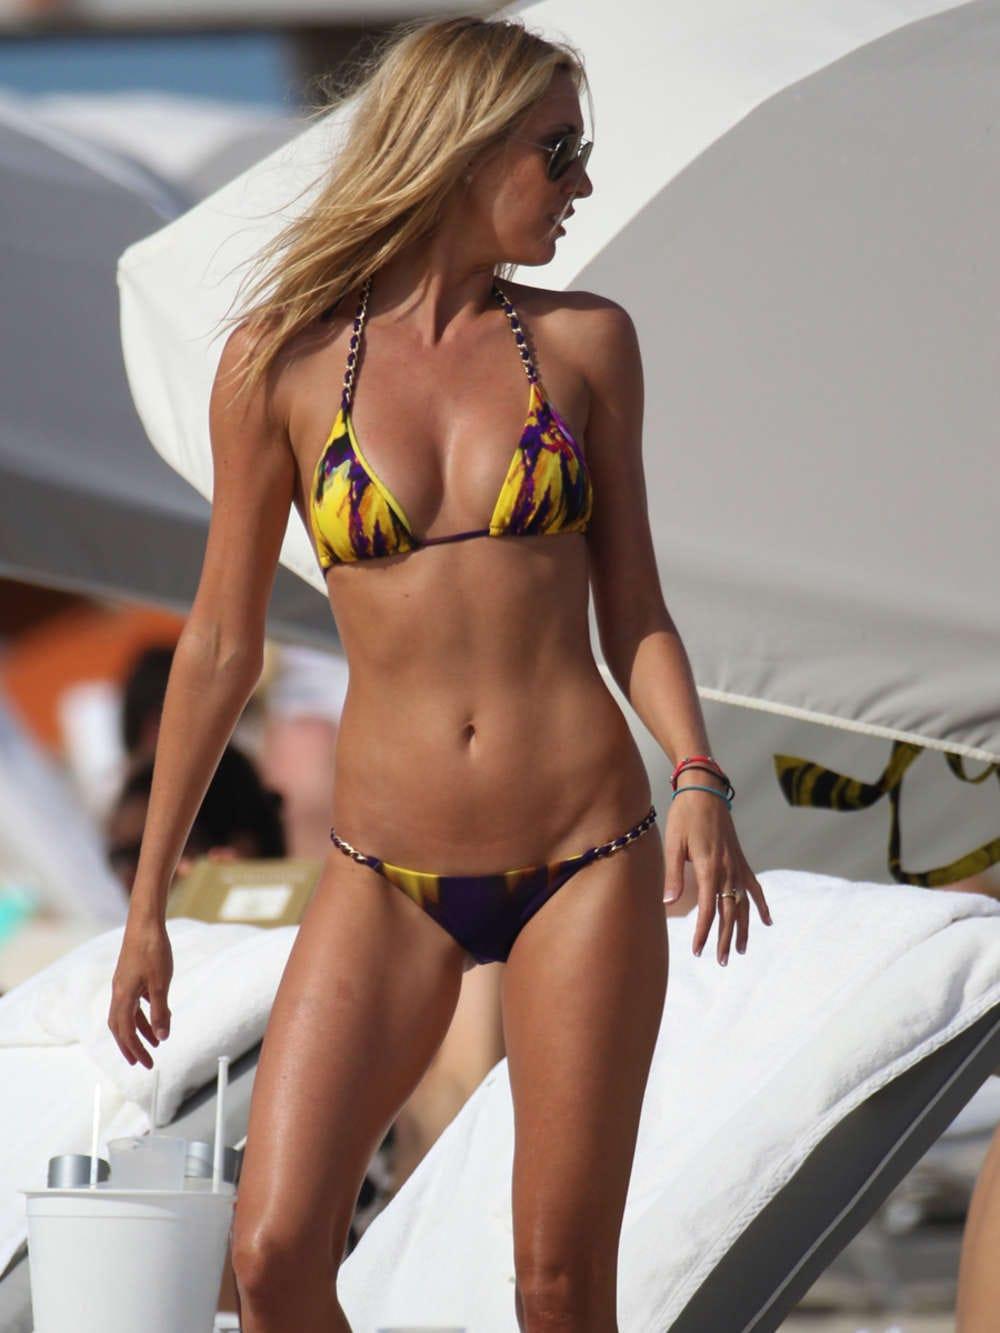 Bikini Laetitia Casta nude (77 photos), Tits, Leaked, Twitter, lingerie 2017